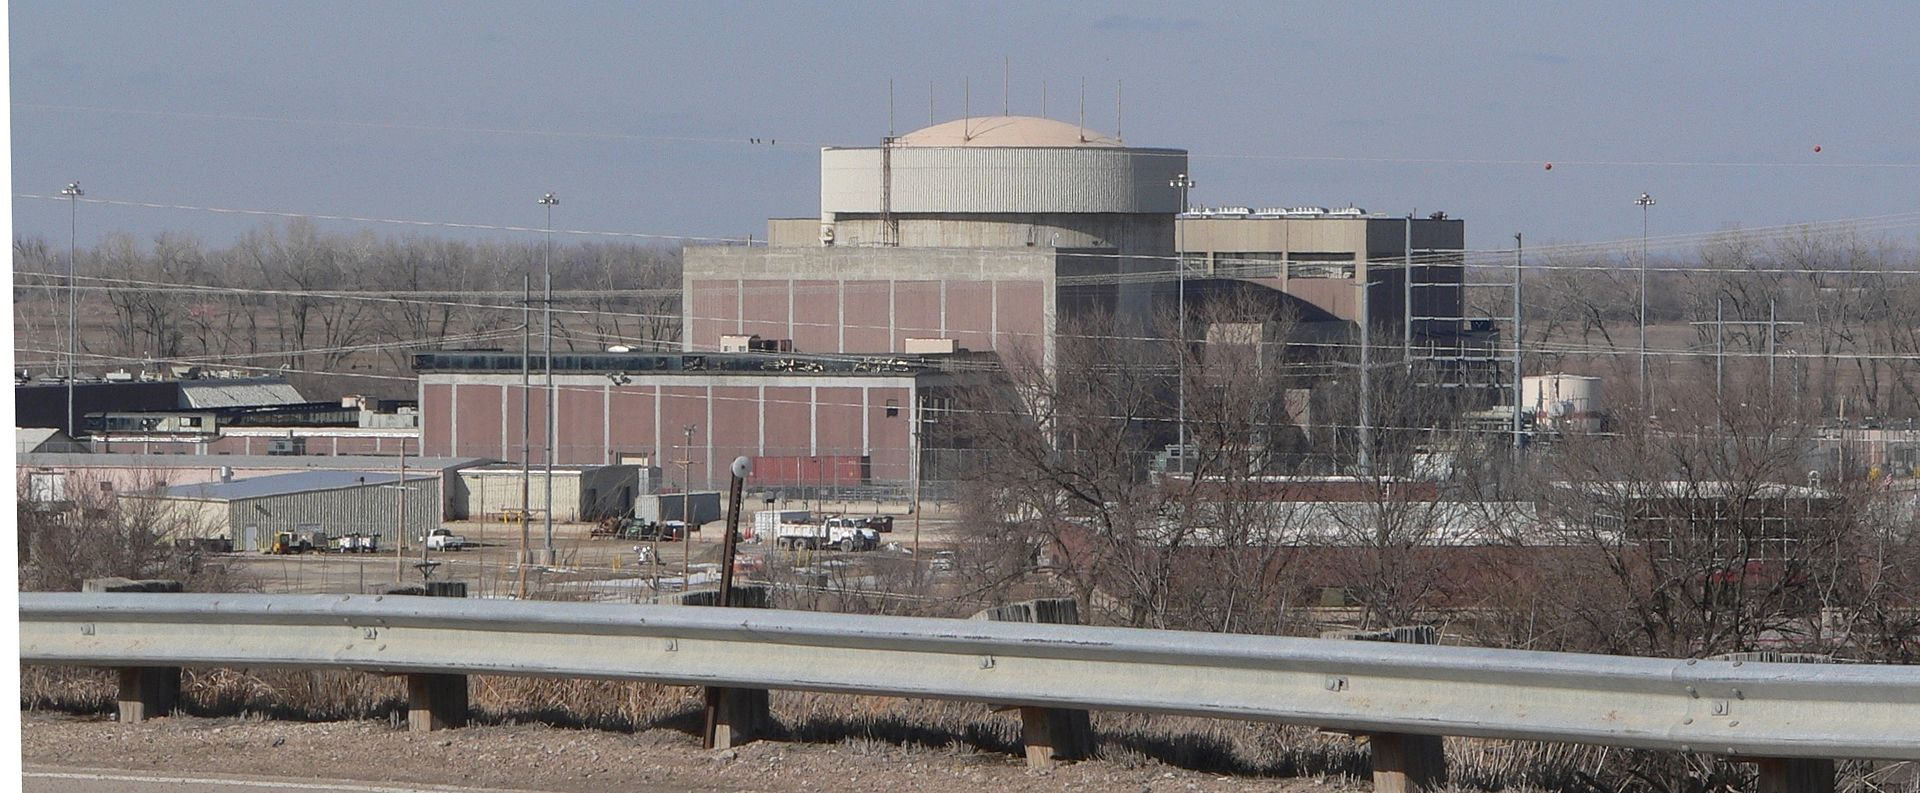 Fort Calhoun power plant